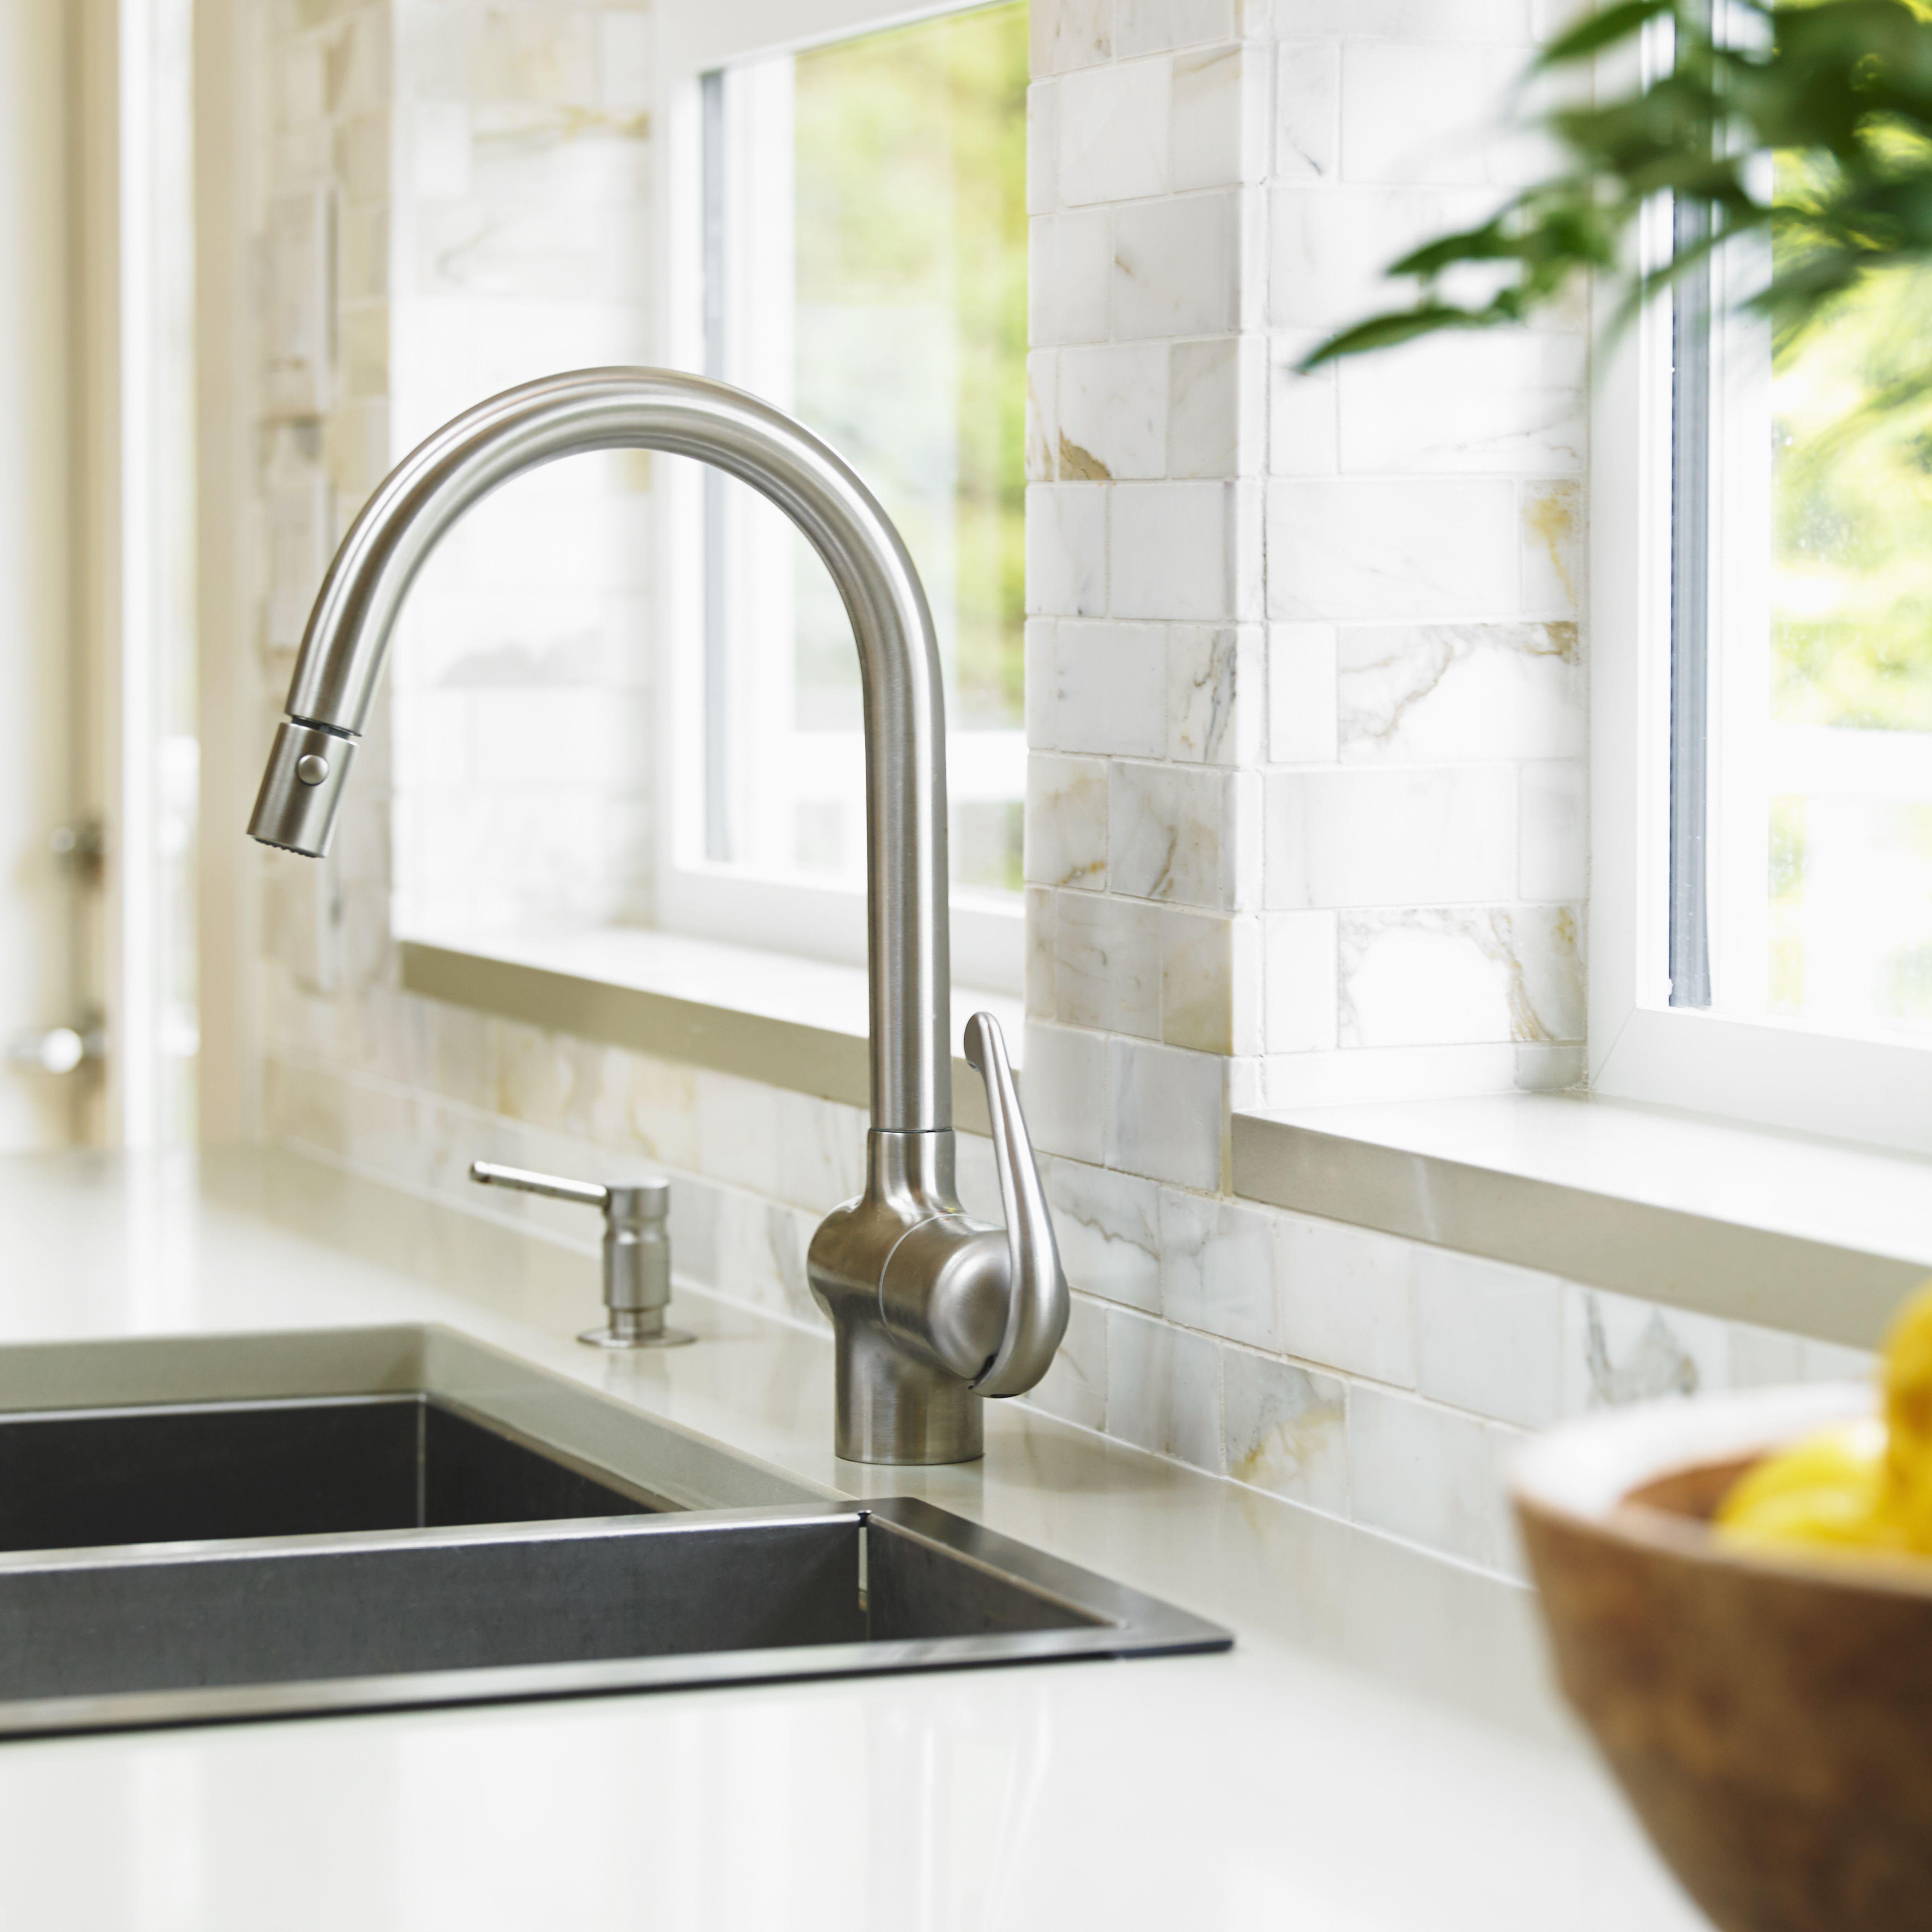 How To Clean Hard Water Deposits Plumbing